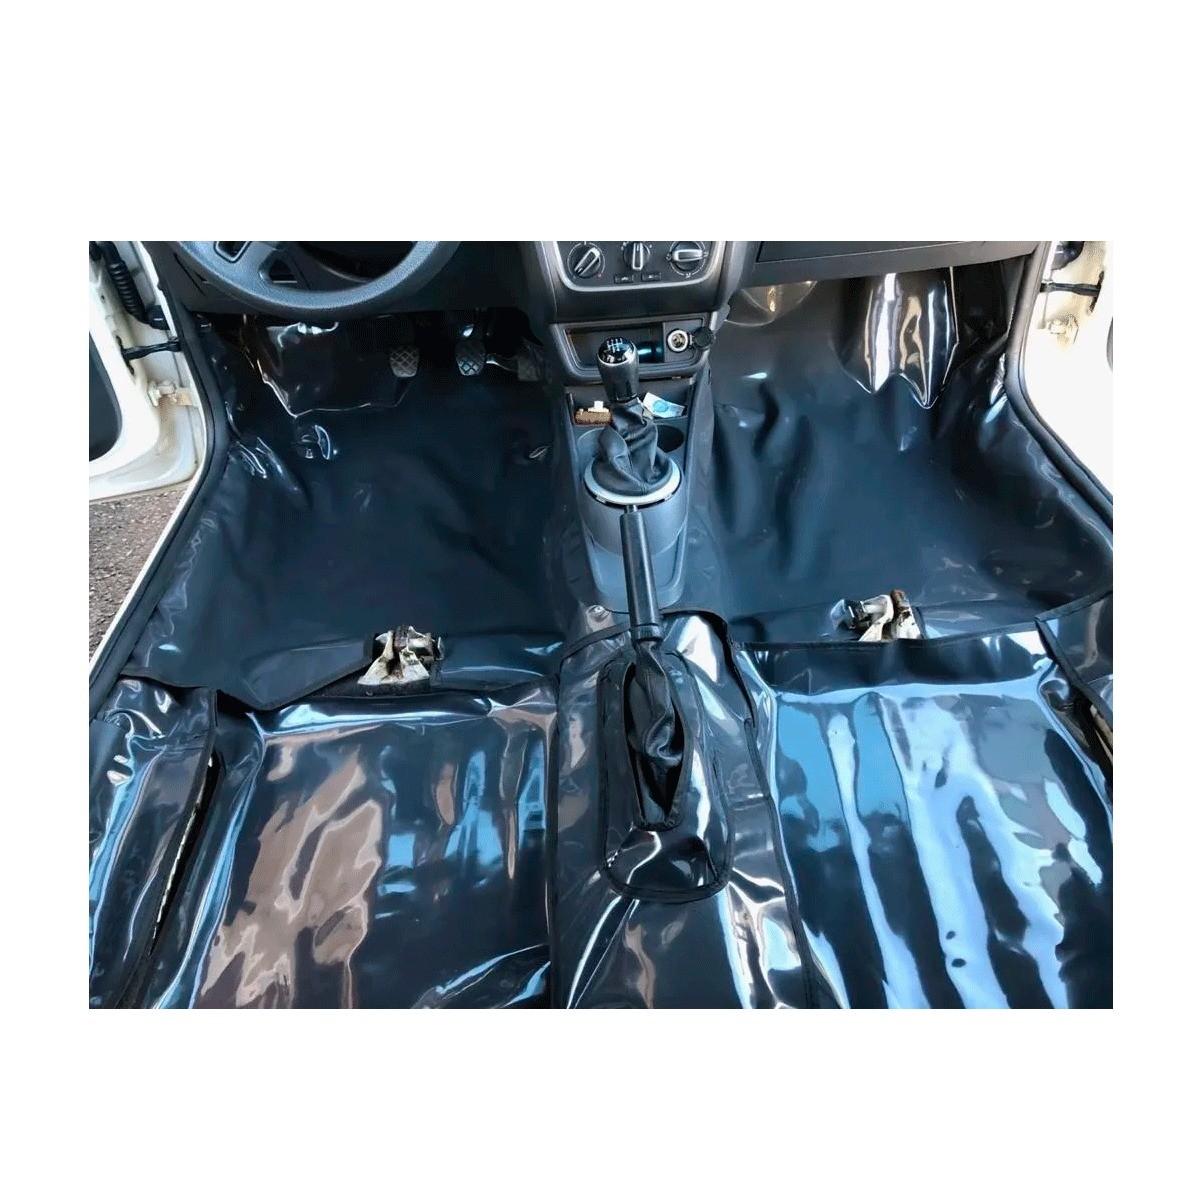 Tapete Proteção Assoalho da Ford Ká 2006 a 2013 em Vinil Verniz Impermeável